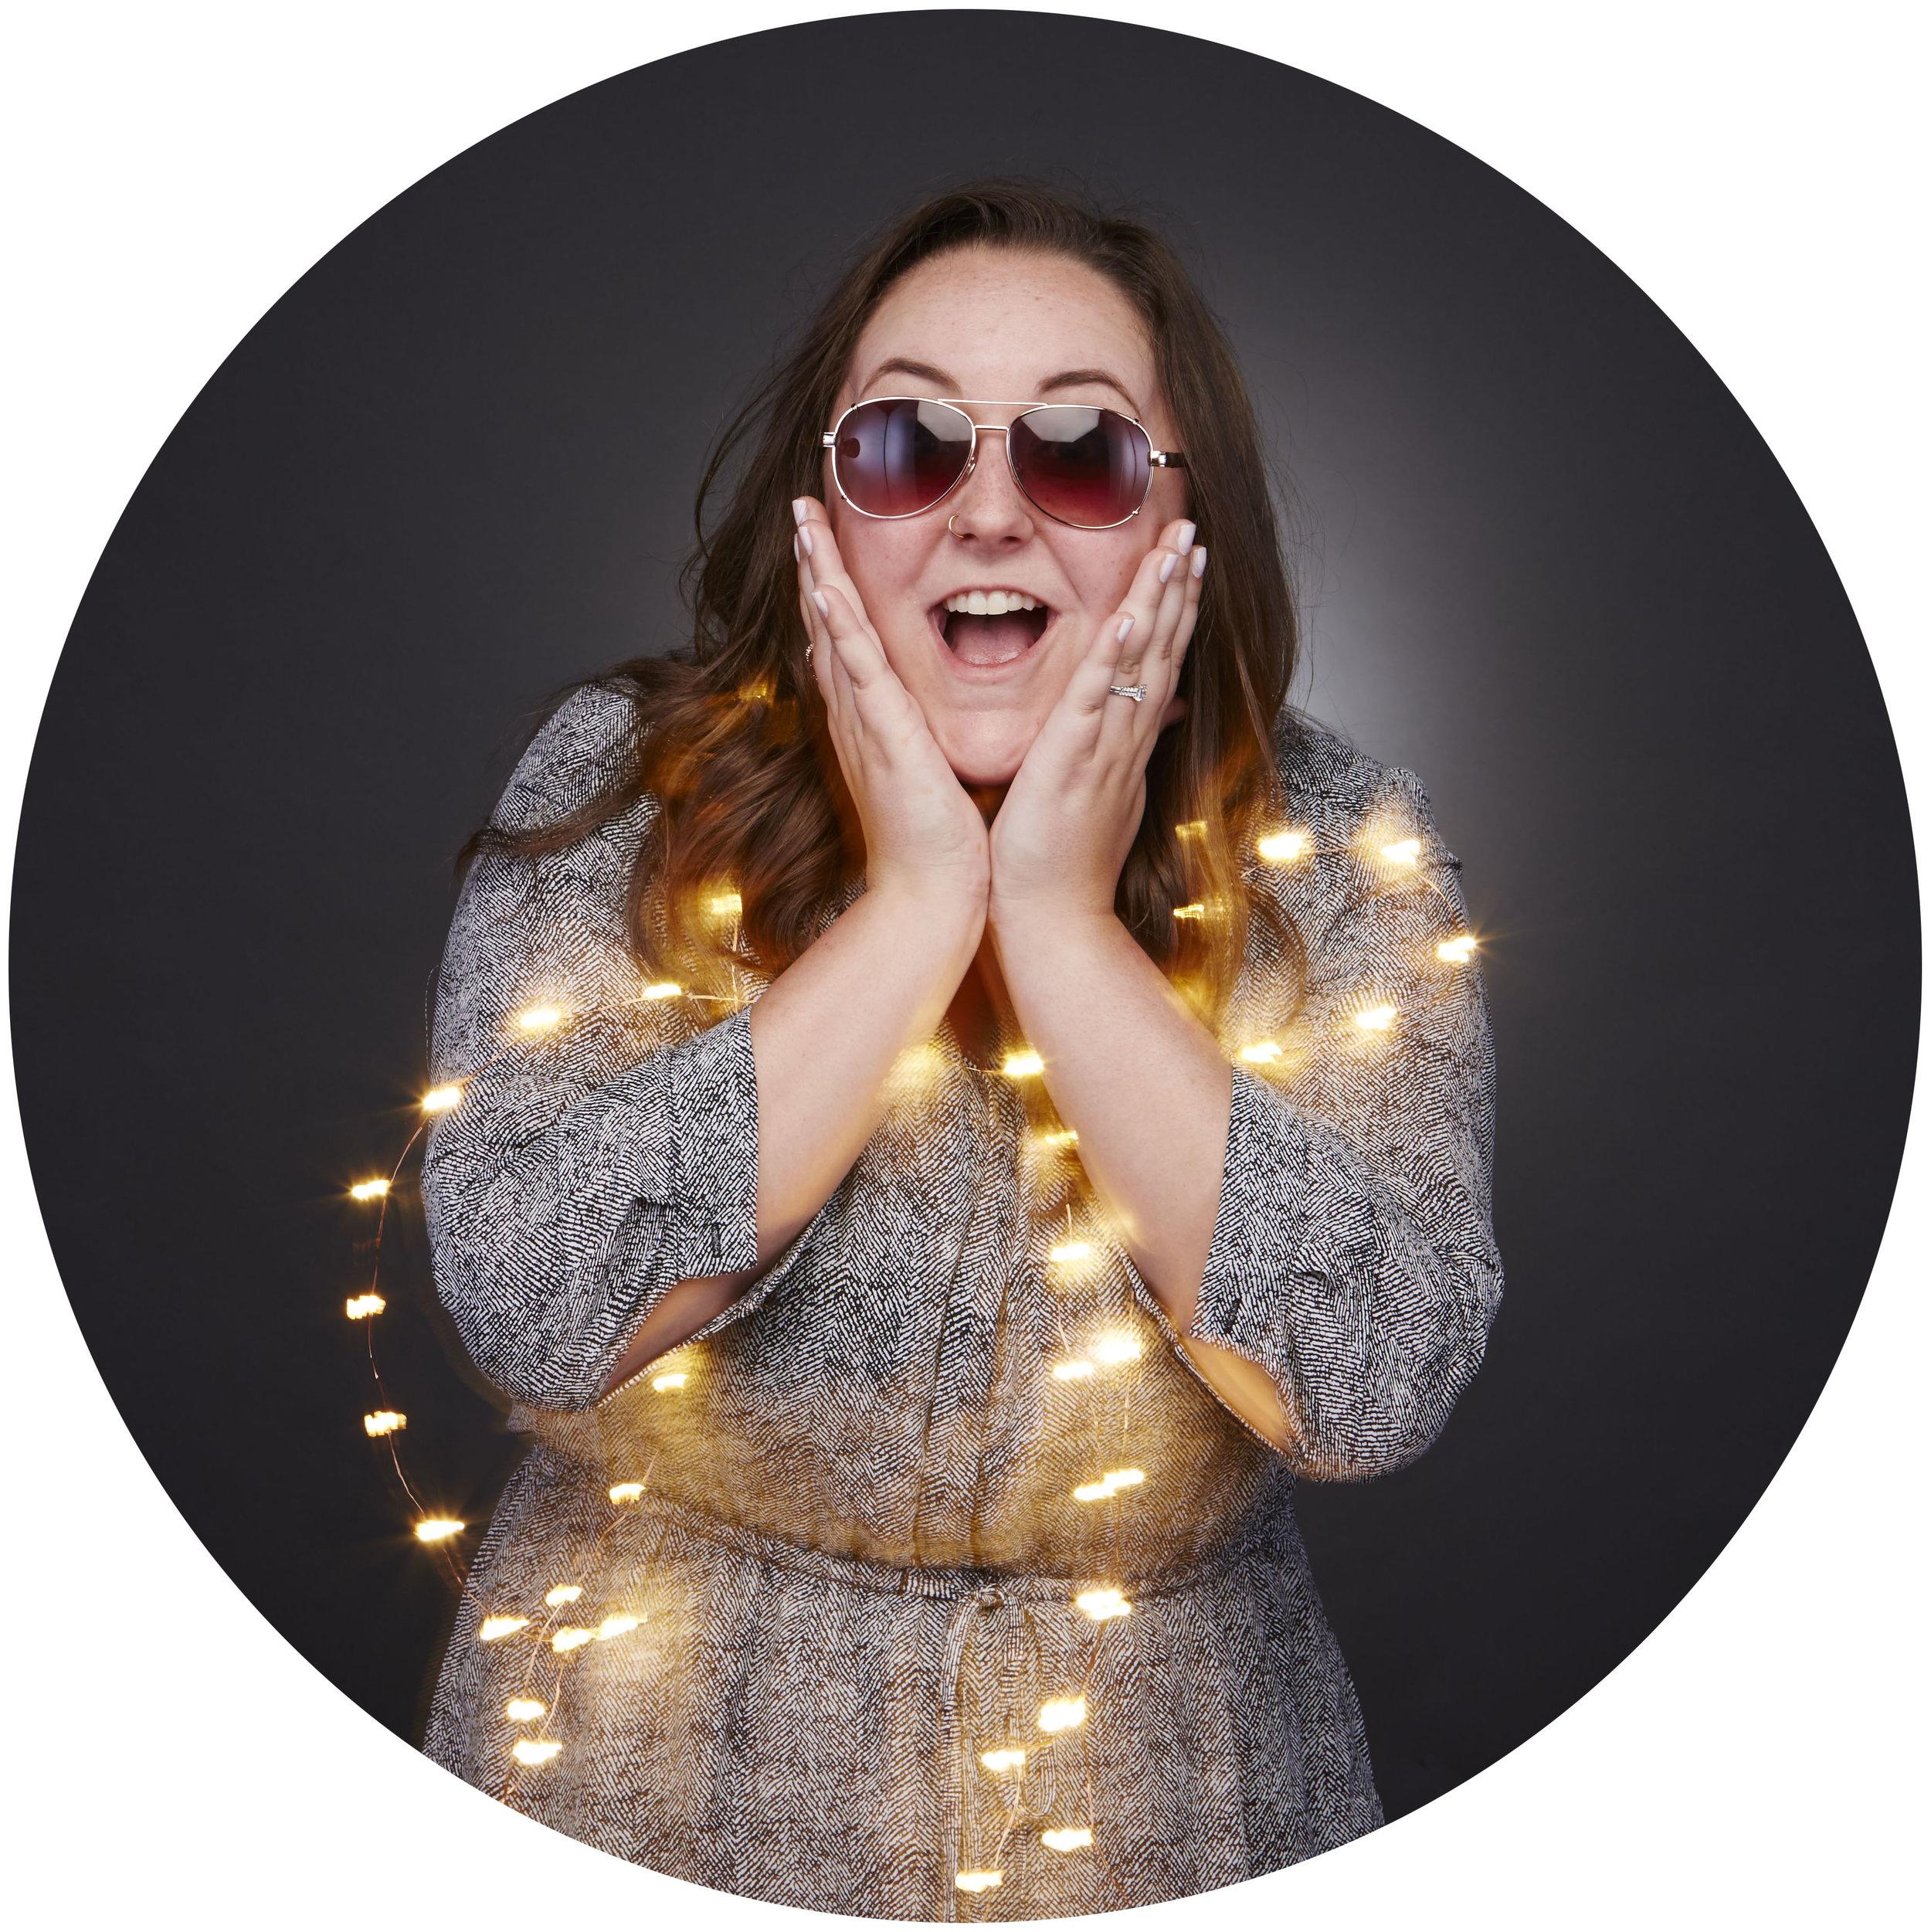 Shelby_lights_circle_white.jpg